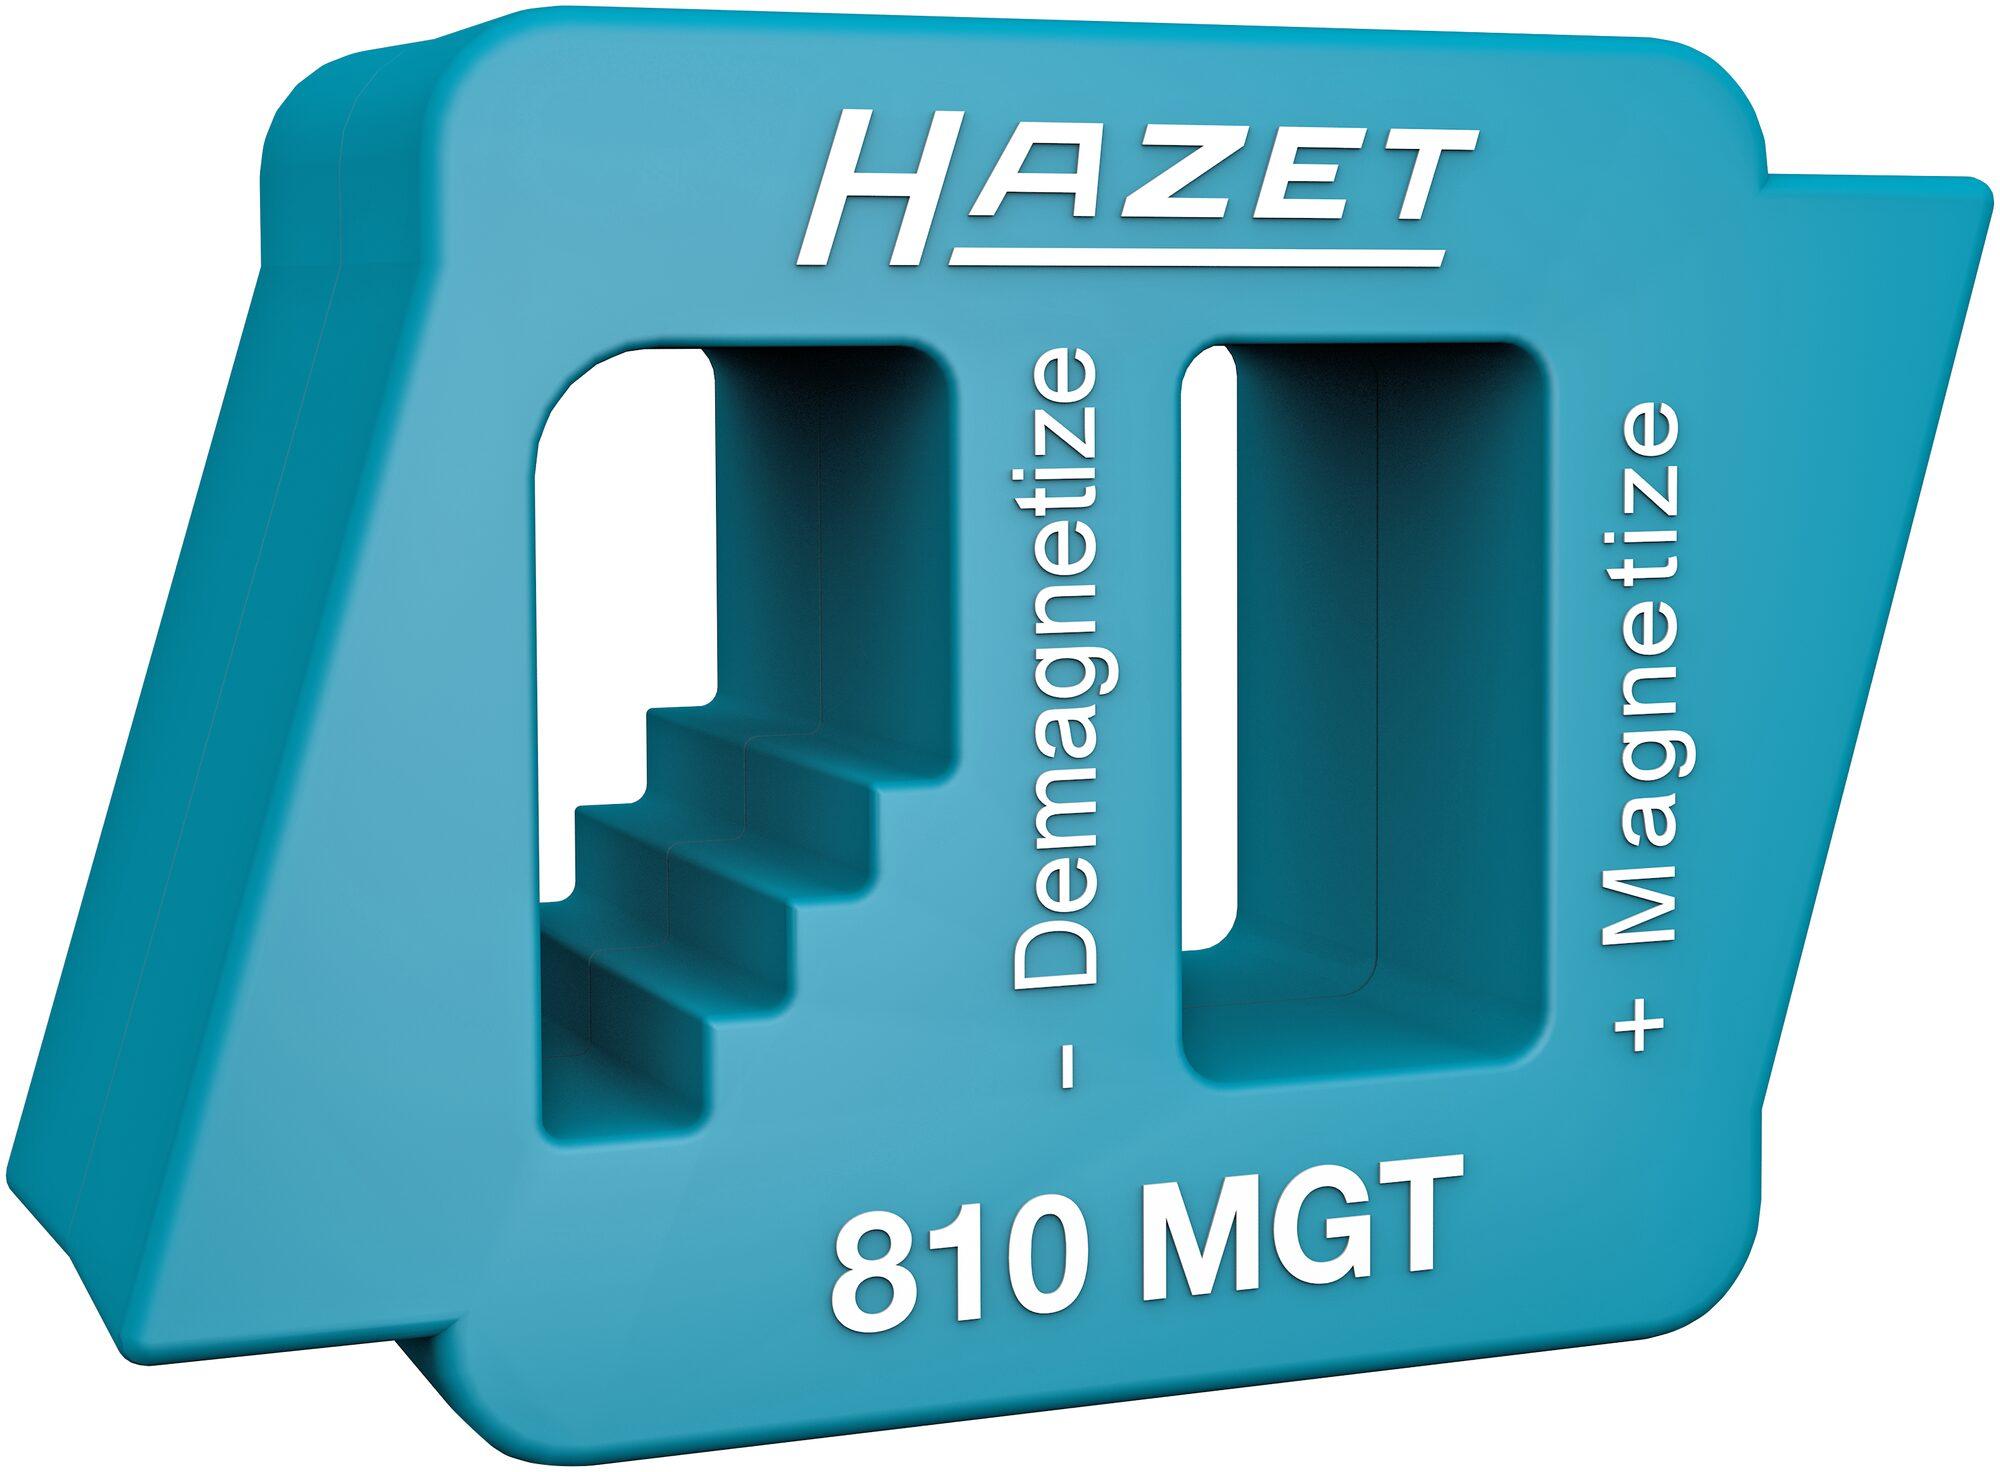 HAZET Magnetisier- / Entmagnetisier-Werkzeug 810MGT